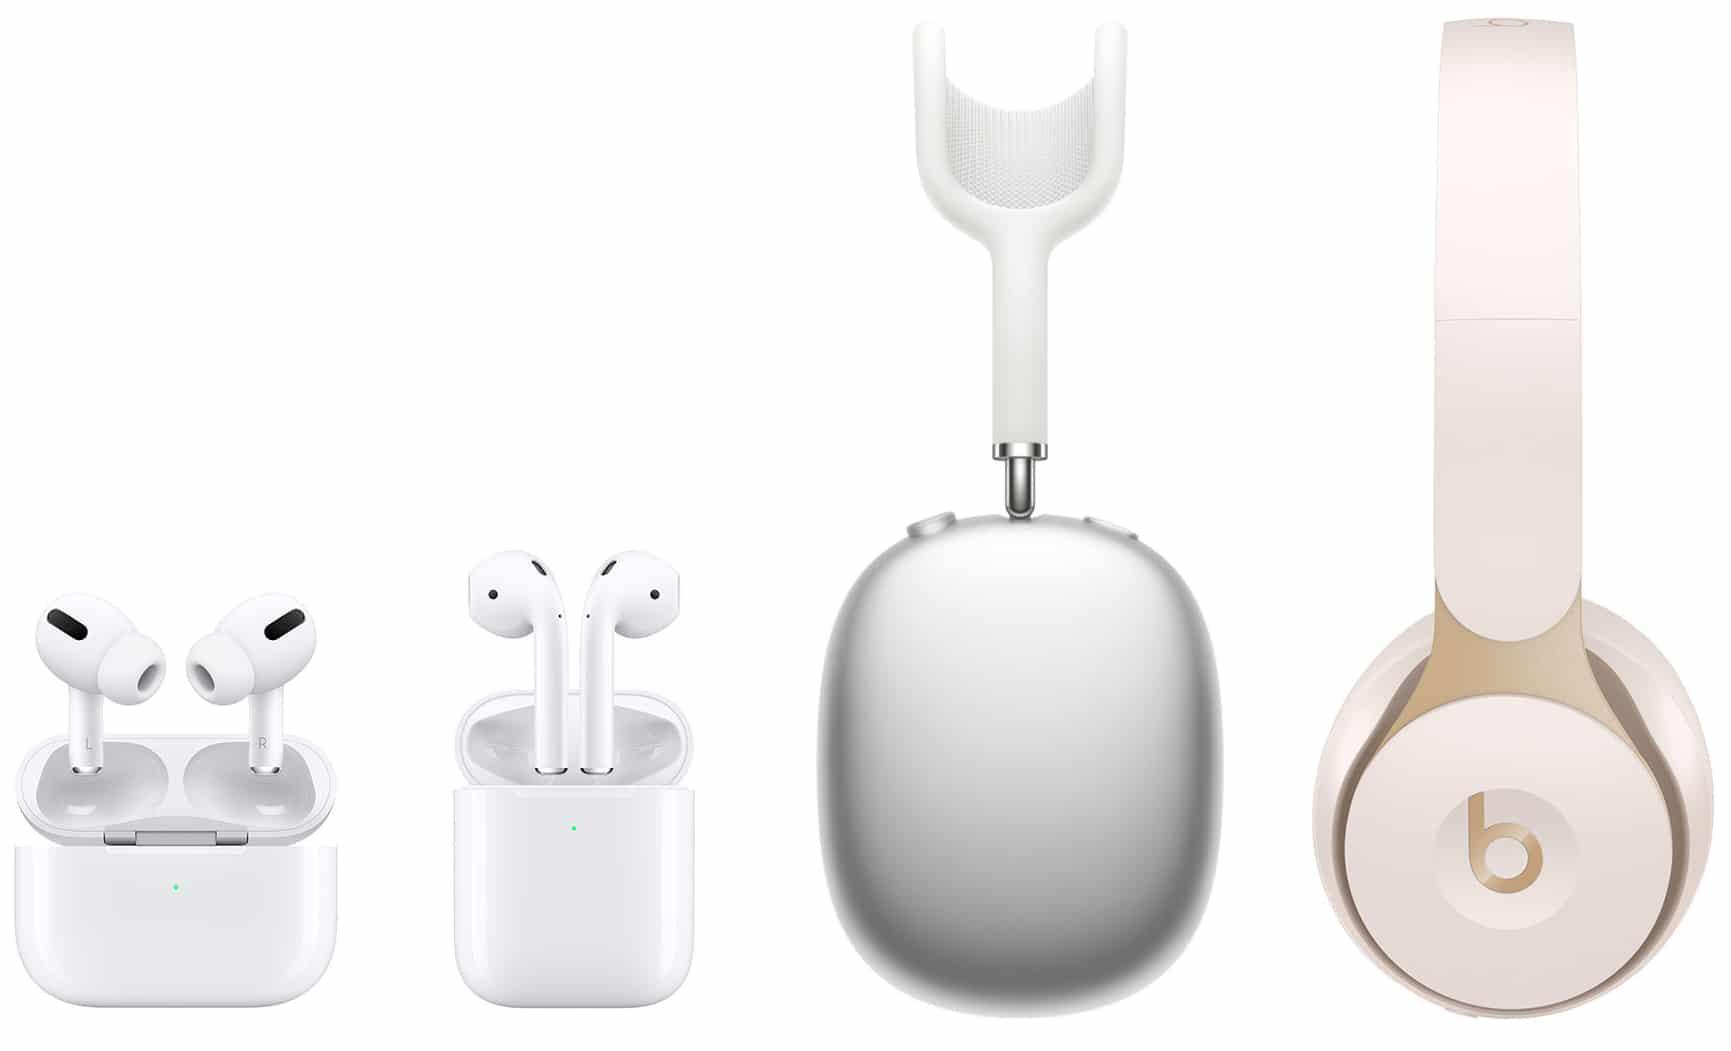 Fones da Apple